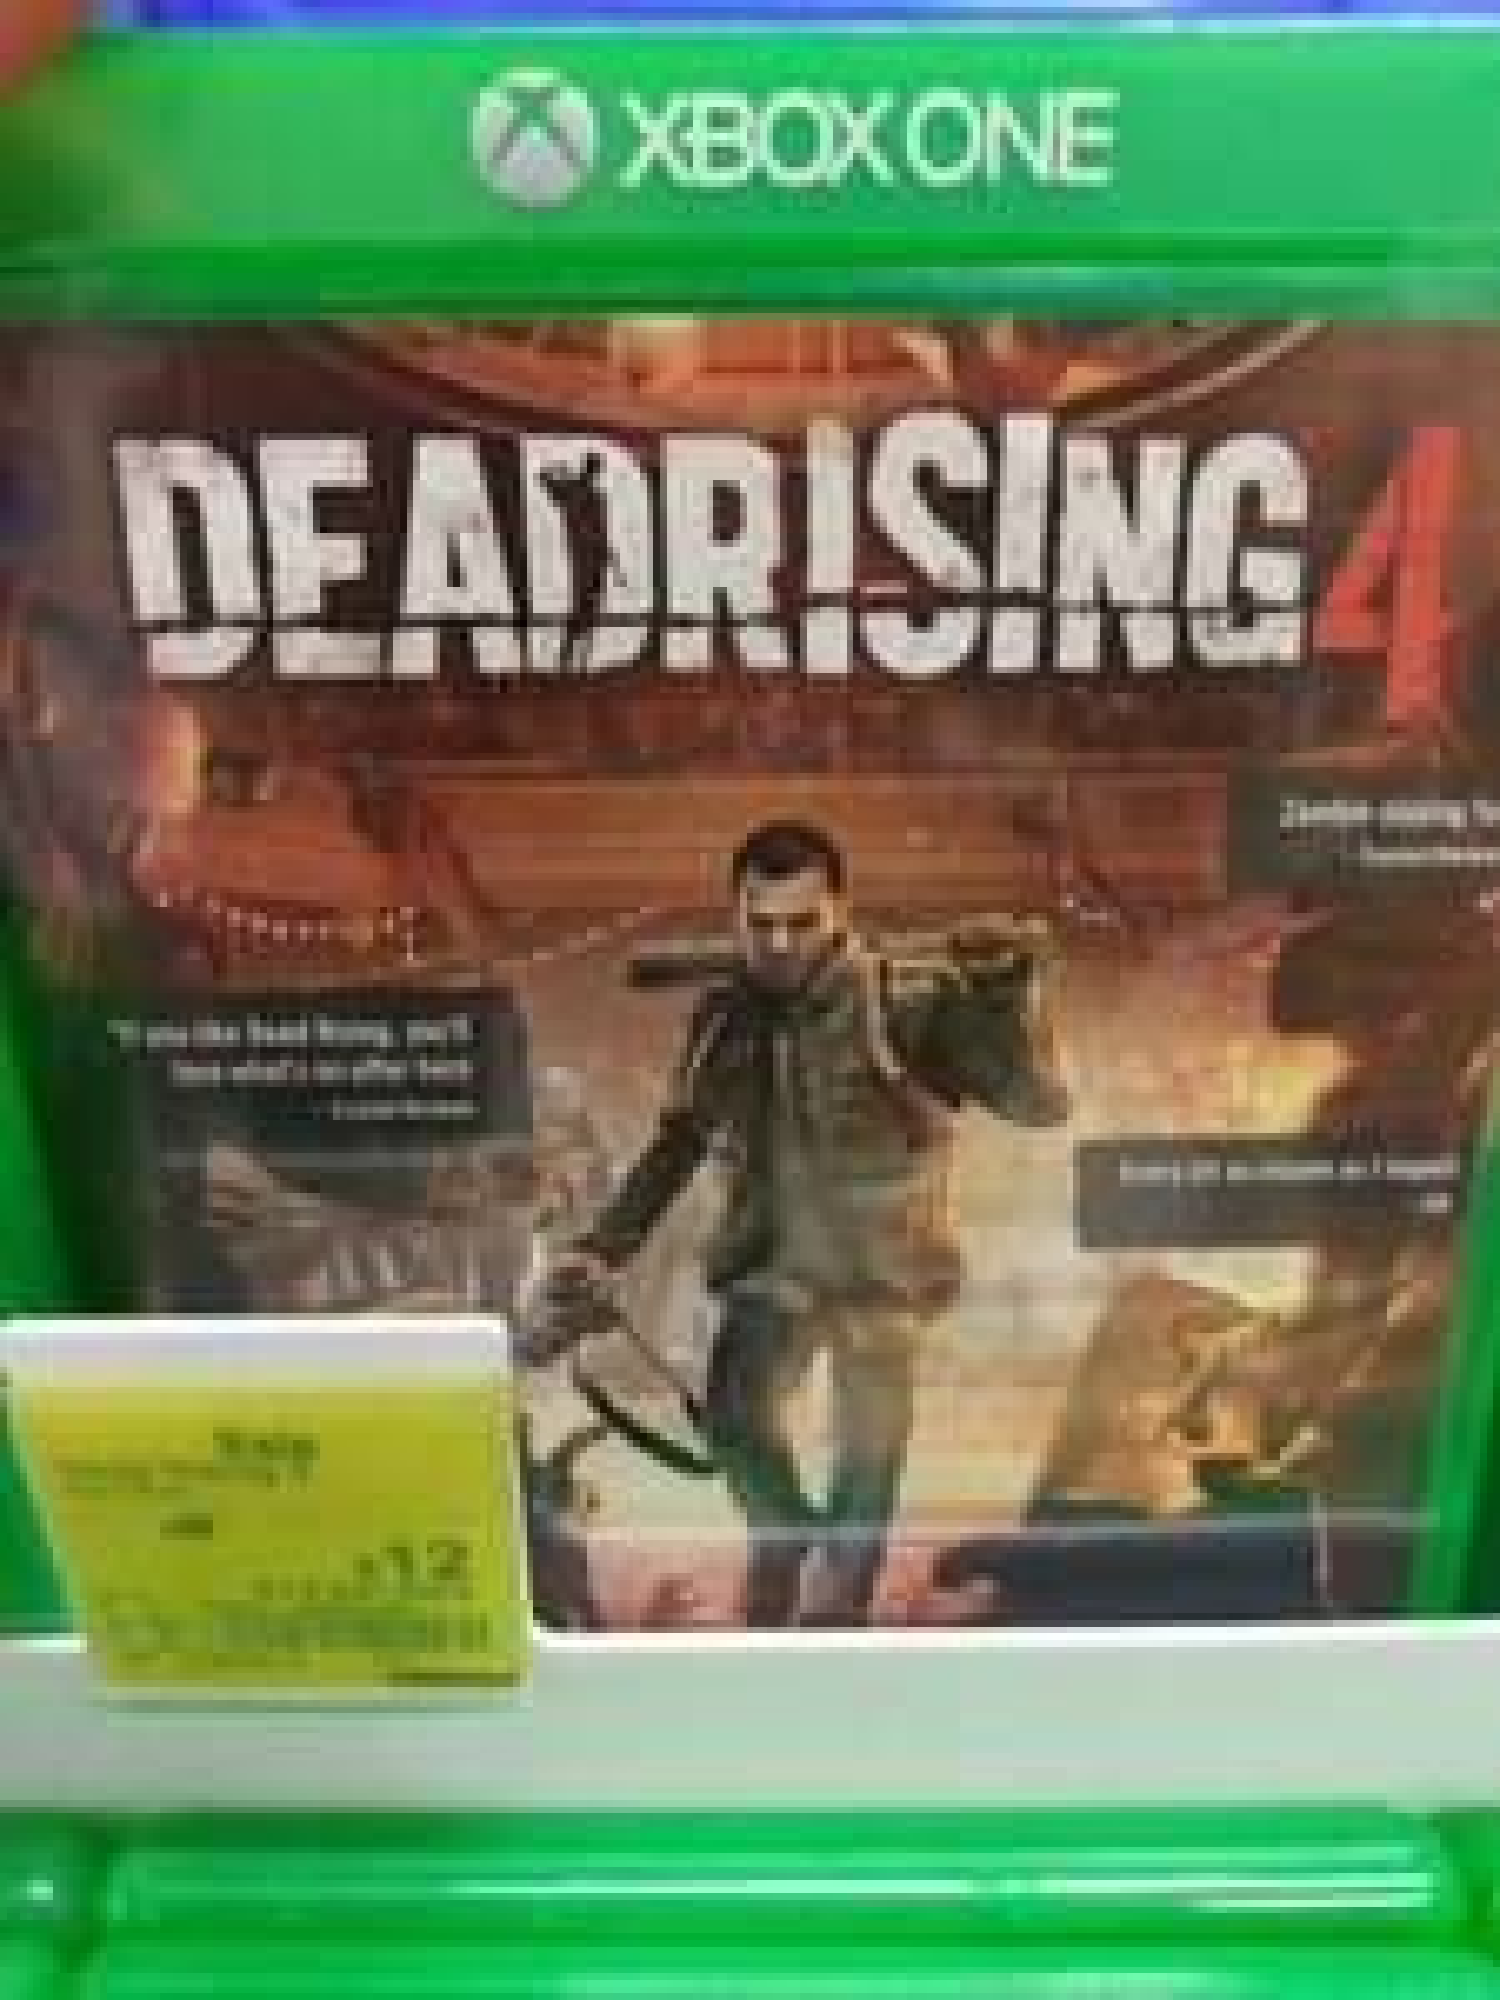 Dead rising 4 Xbox One adsa in-store 12.00